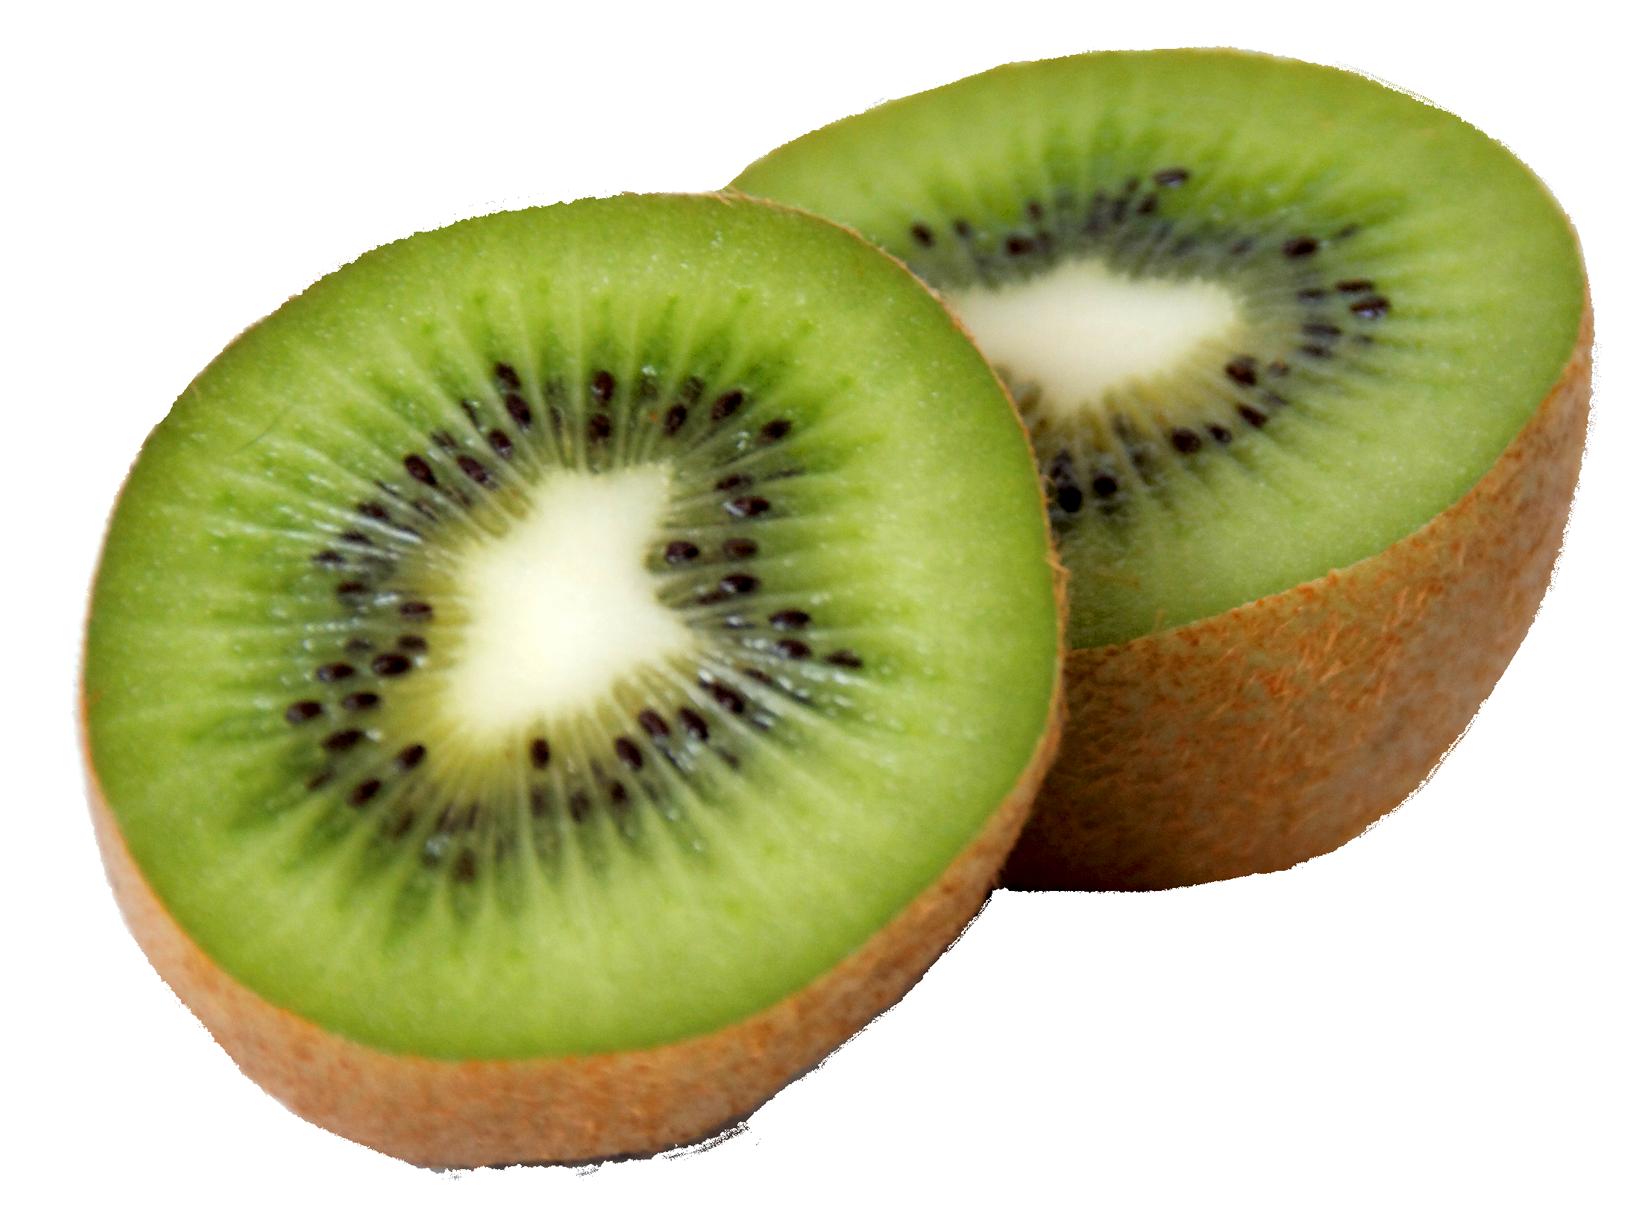 Kiwi Fruit PNG Image.